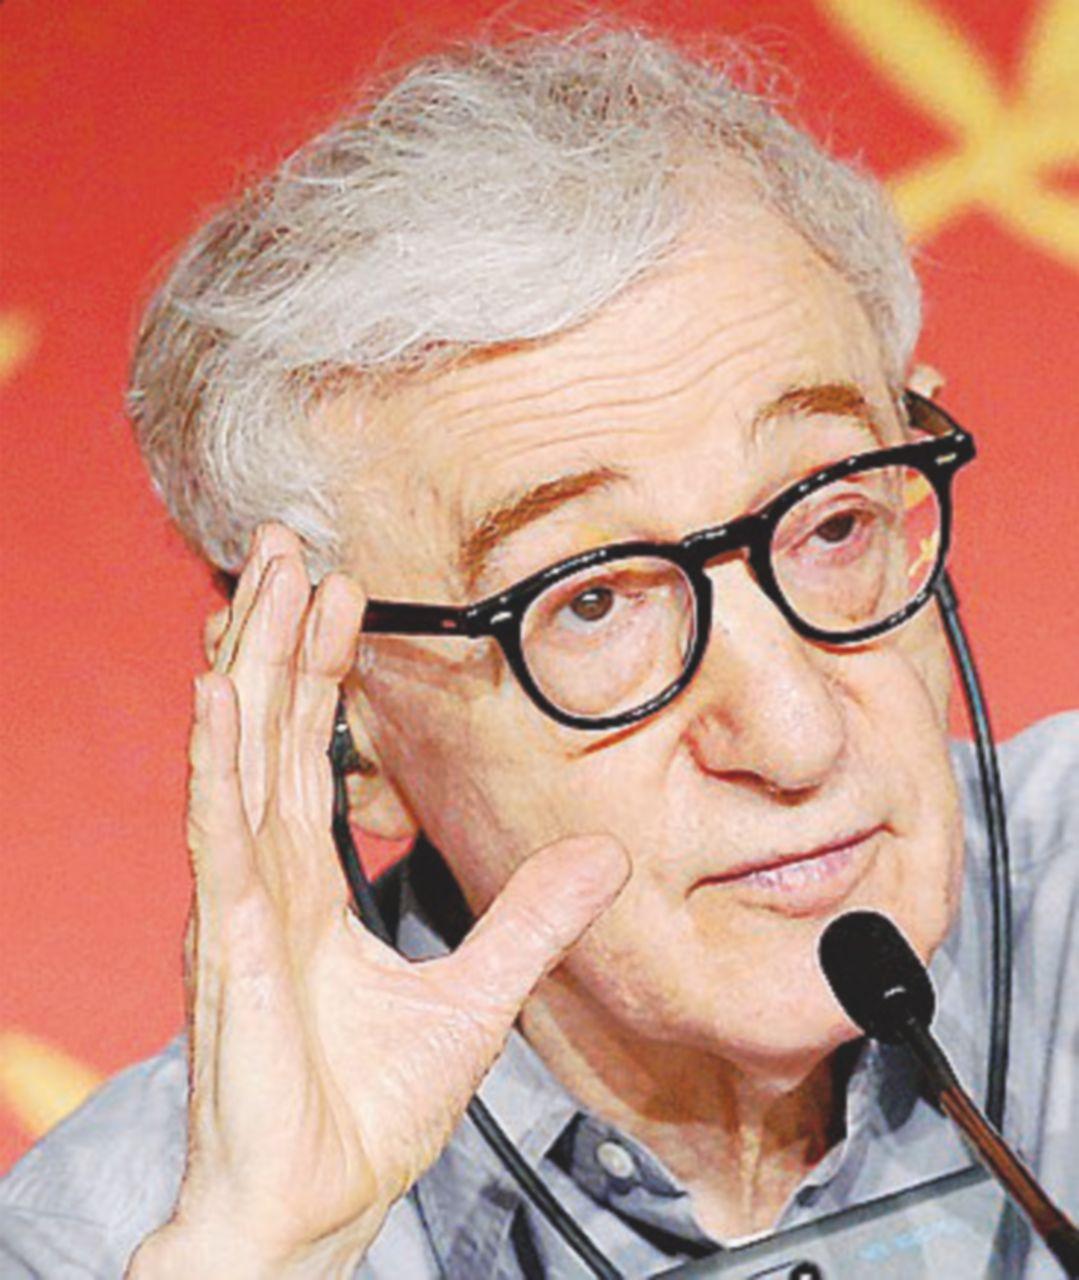 Woody Allen a quota 51 (film). Lo produrrà Amazon Studios